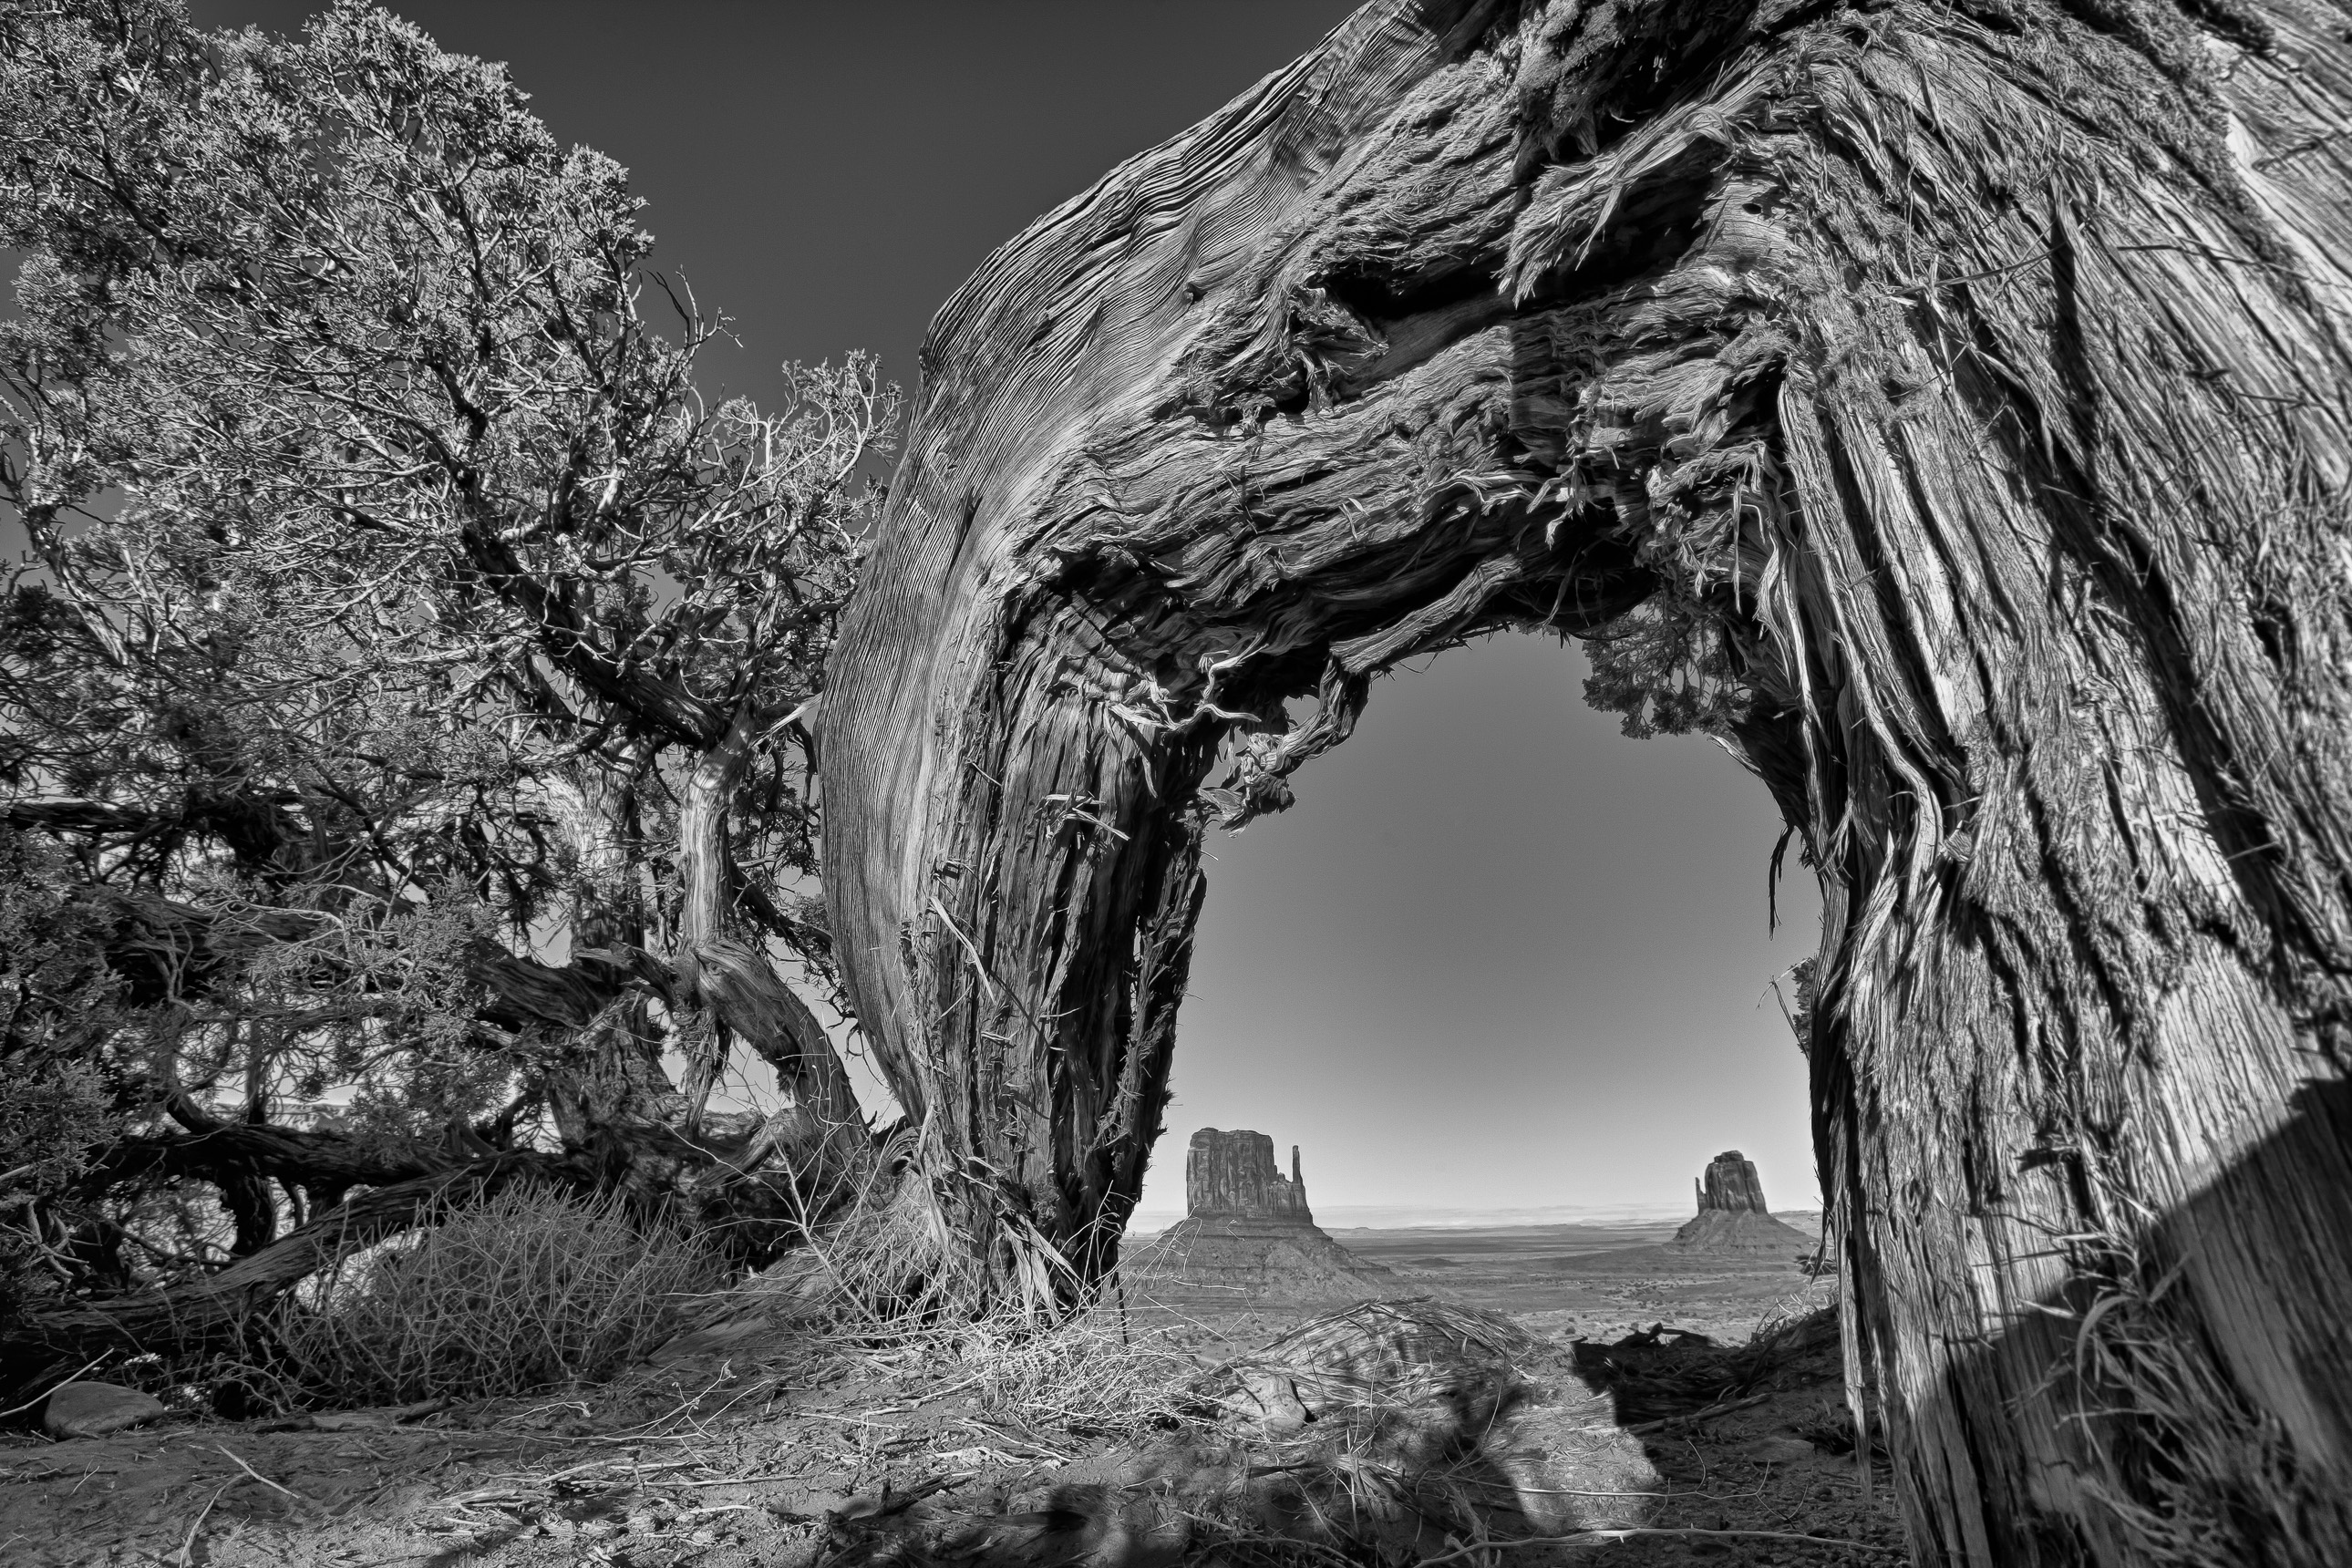 Monument Valley under an arching juniper